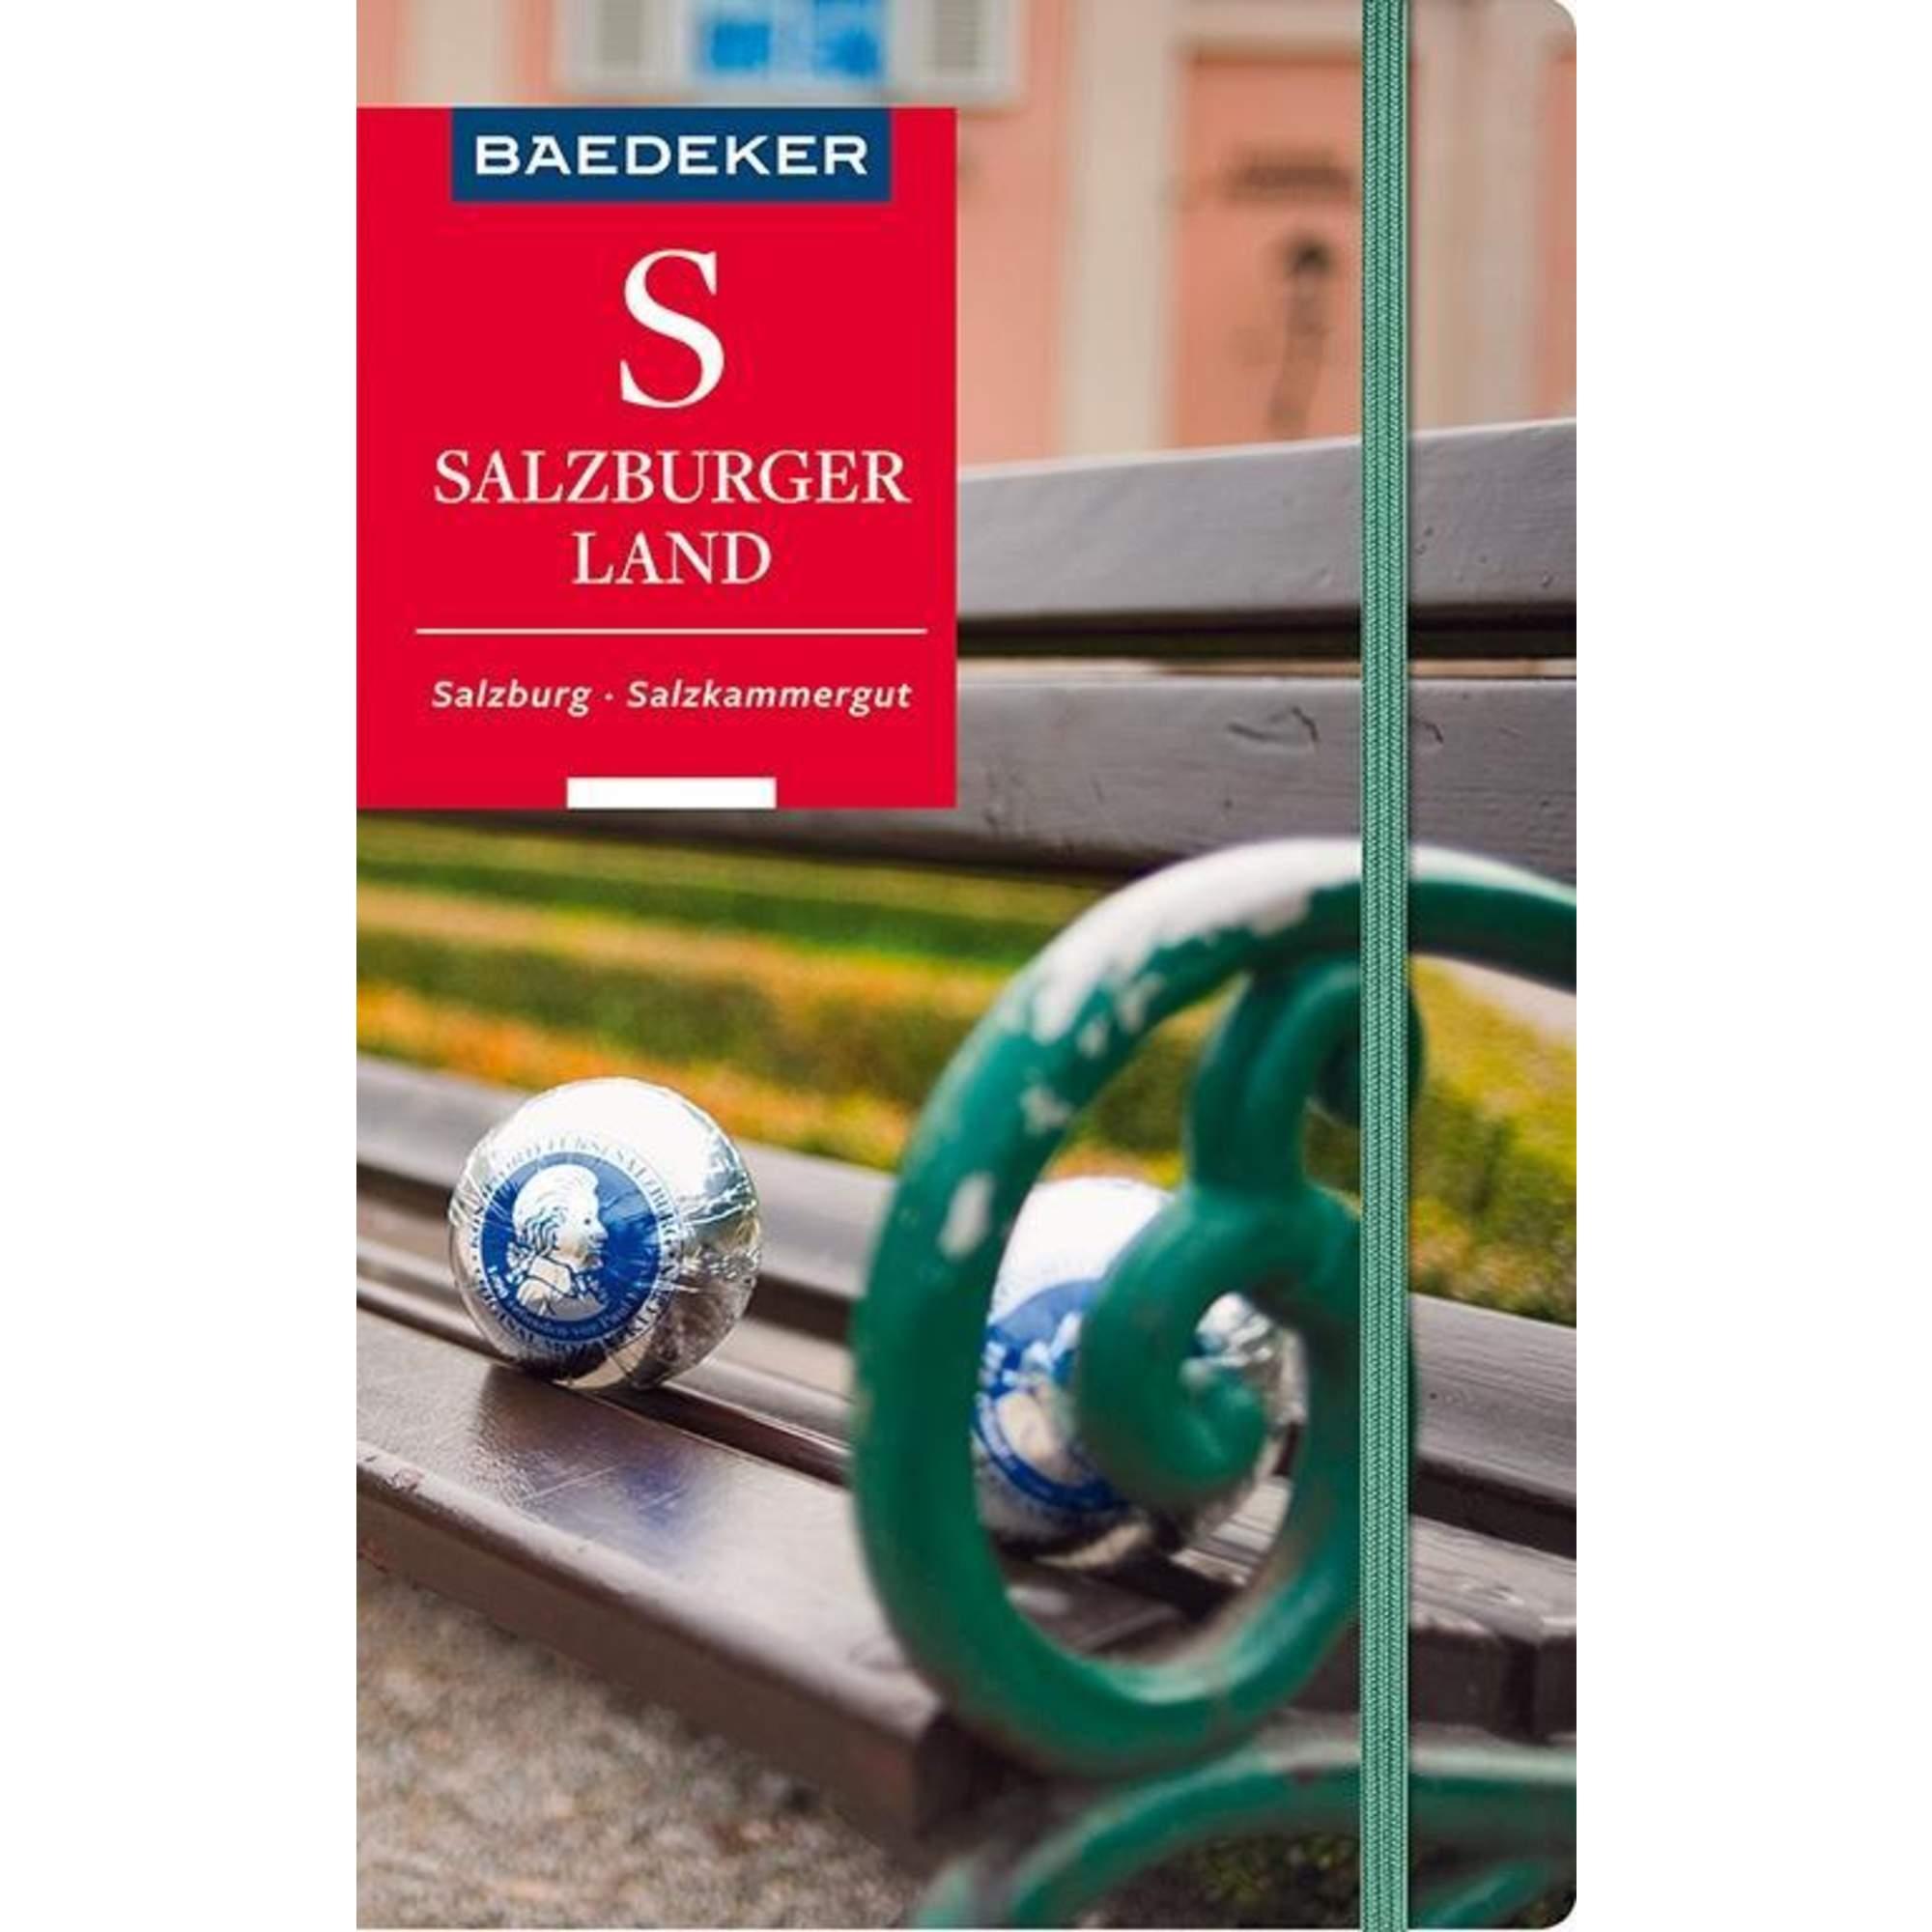 Baedeker Reiseführer Salzburger Land, Salzburg, Salzkammergut, 21,99 Euro